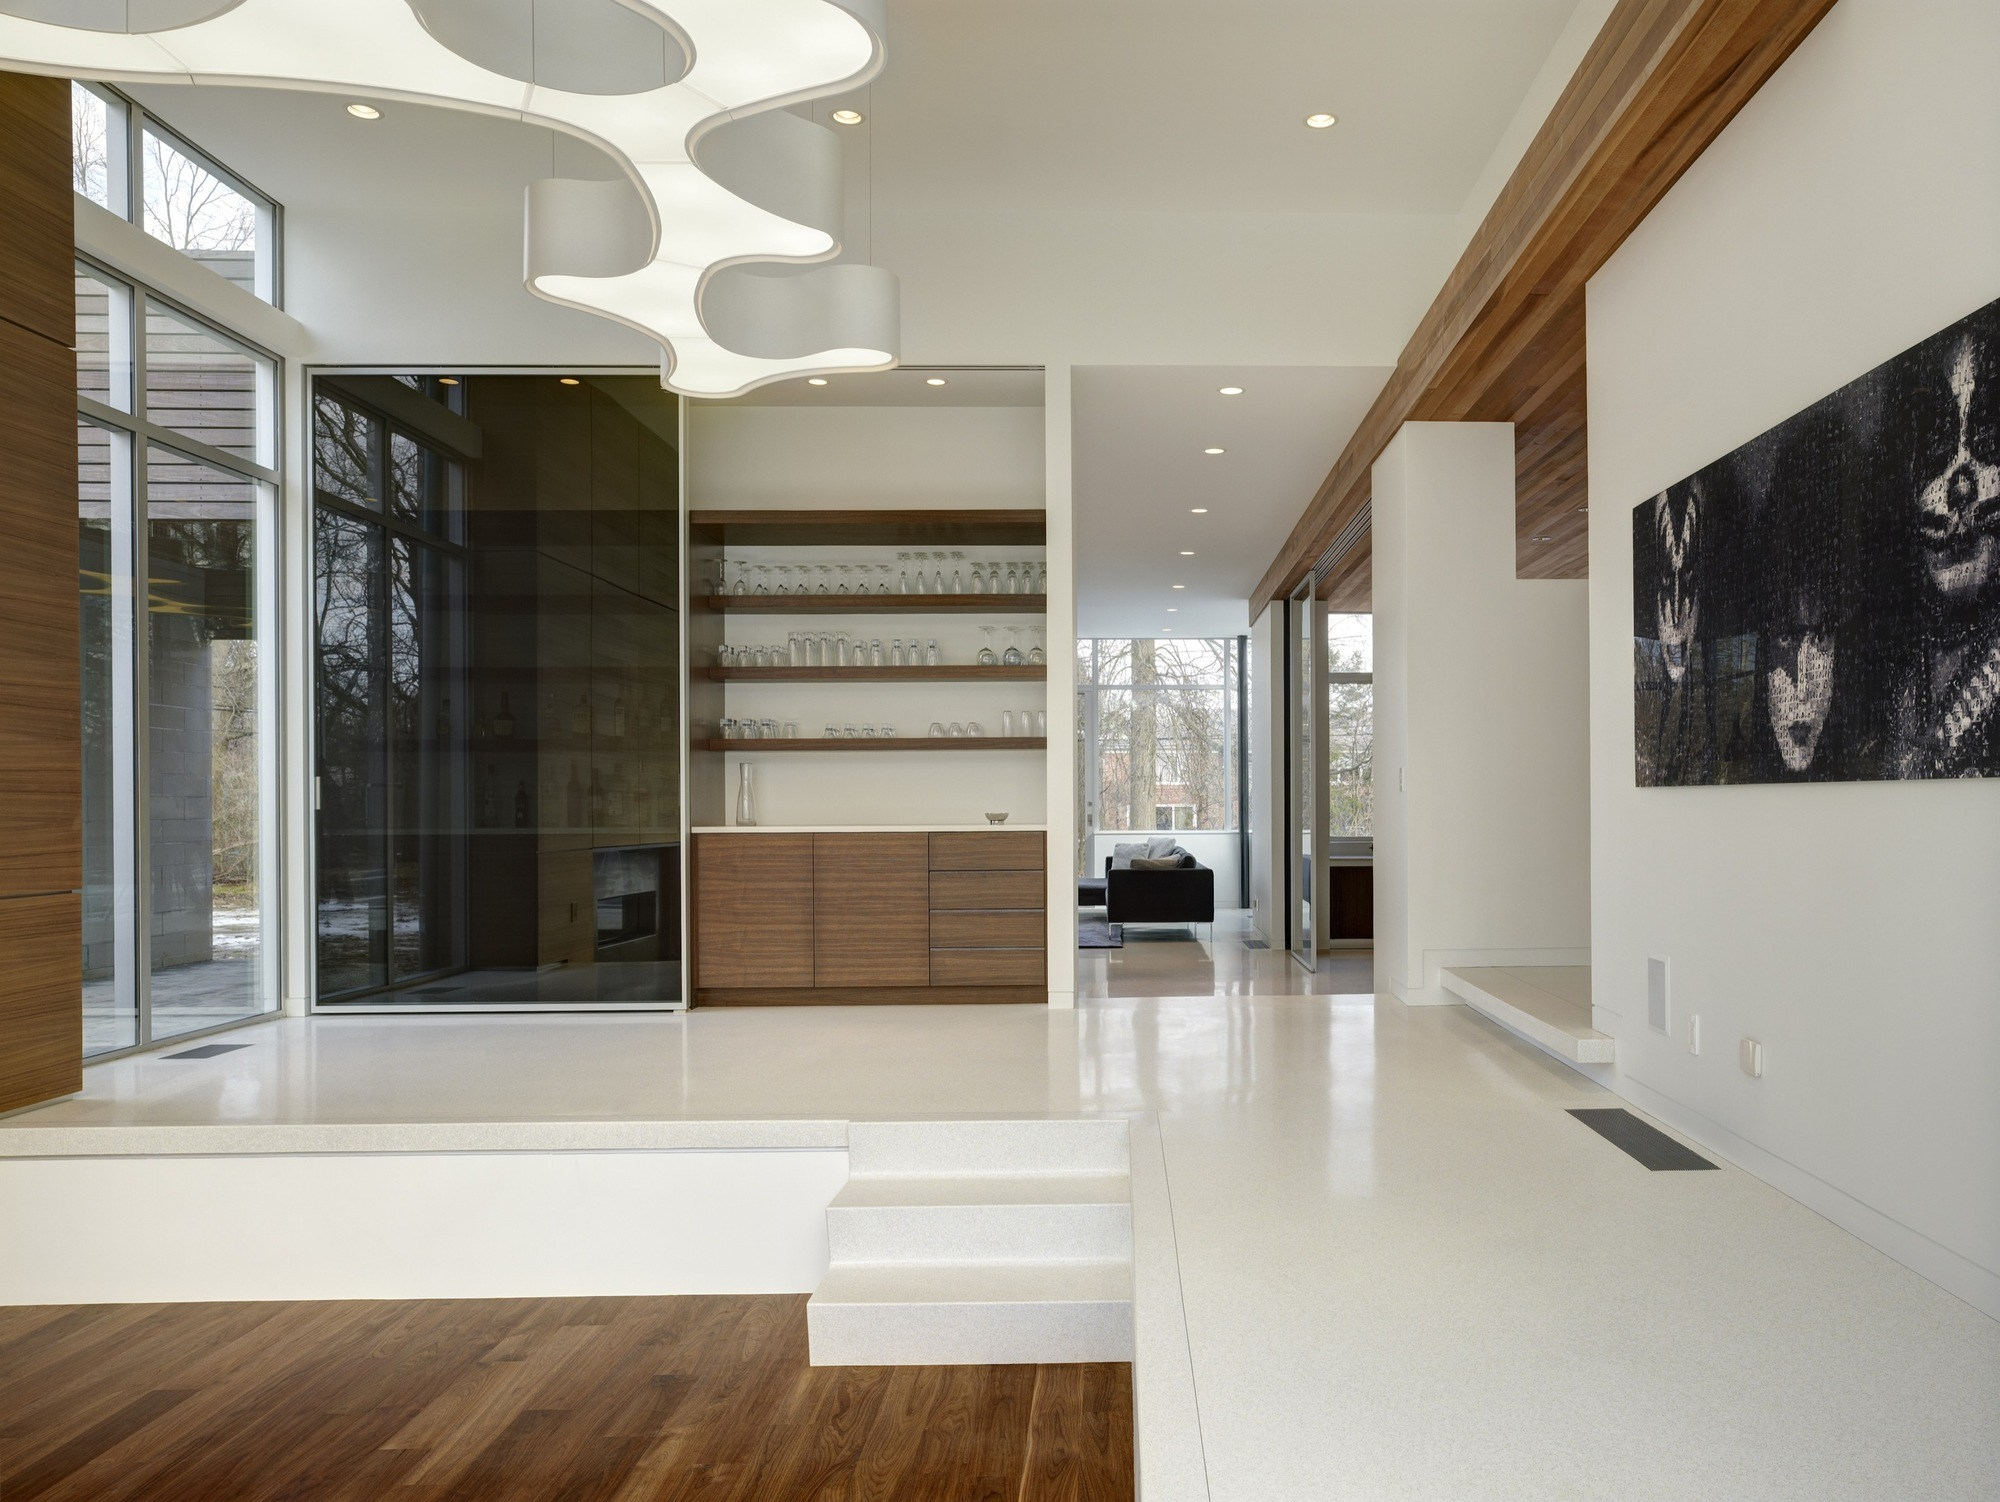 shaker heights housedimit architects | karmatrendz